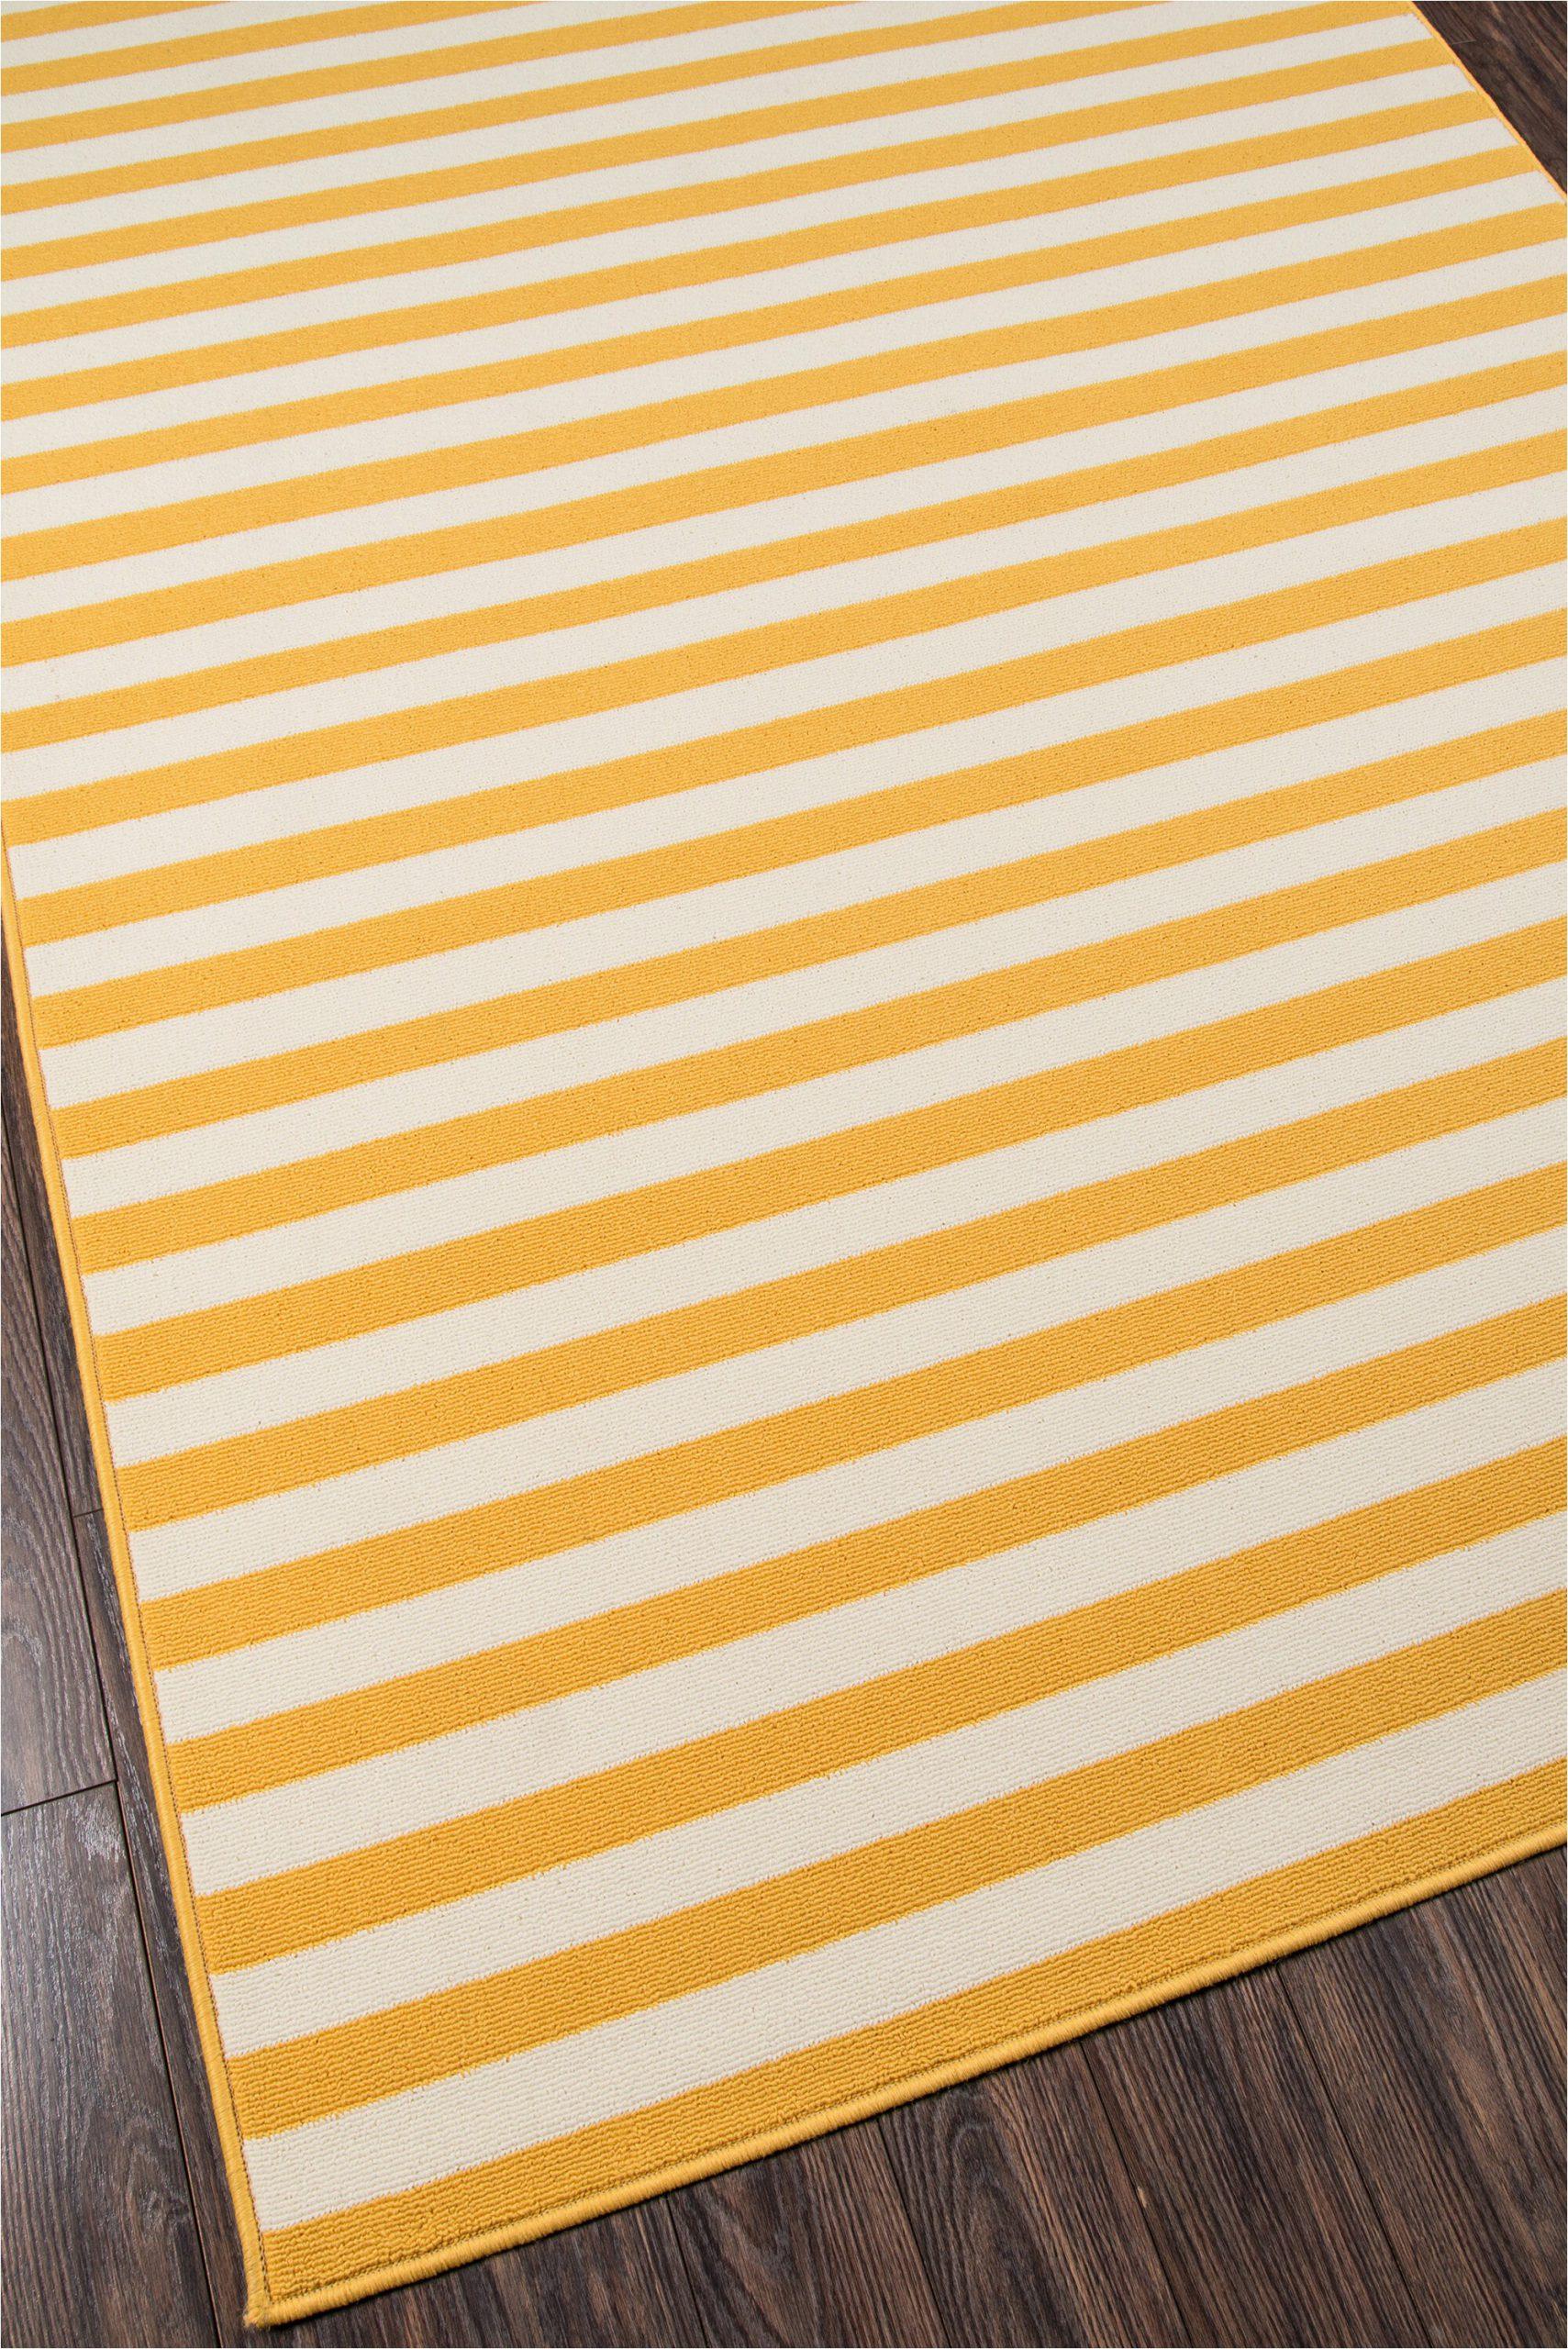 halliday striped yellowwhite indoor outdoor area rug